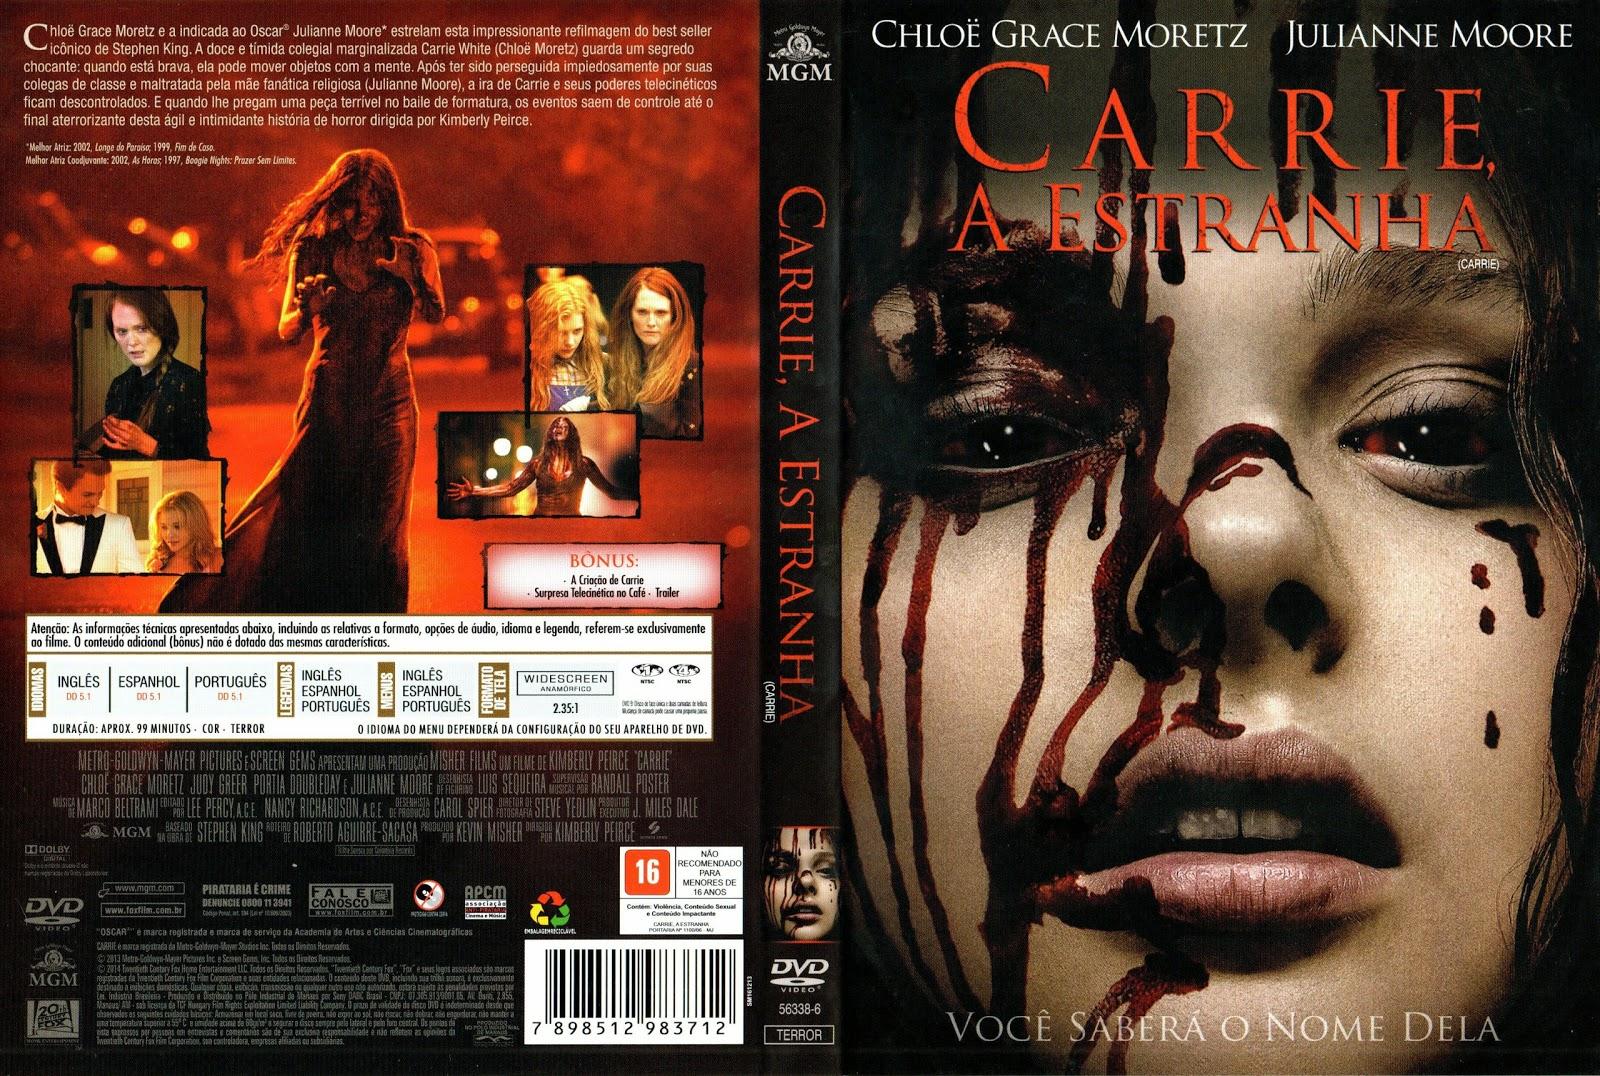 Capa DVD Carrie A Estranha